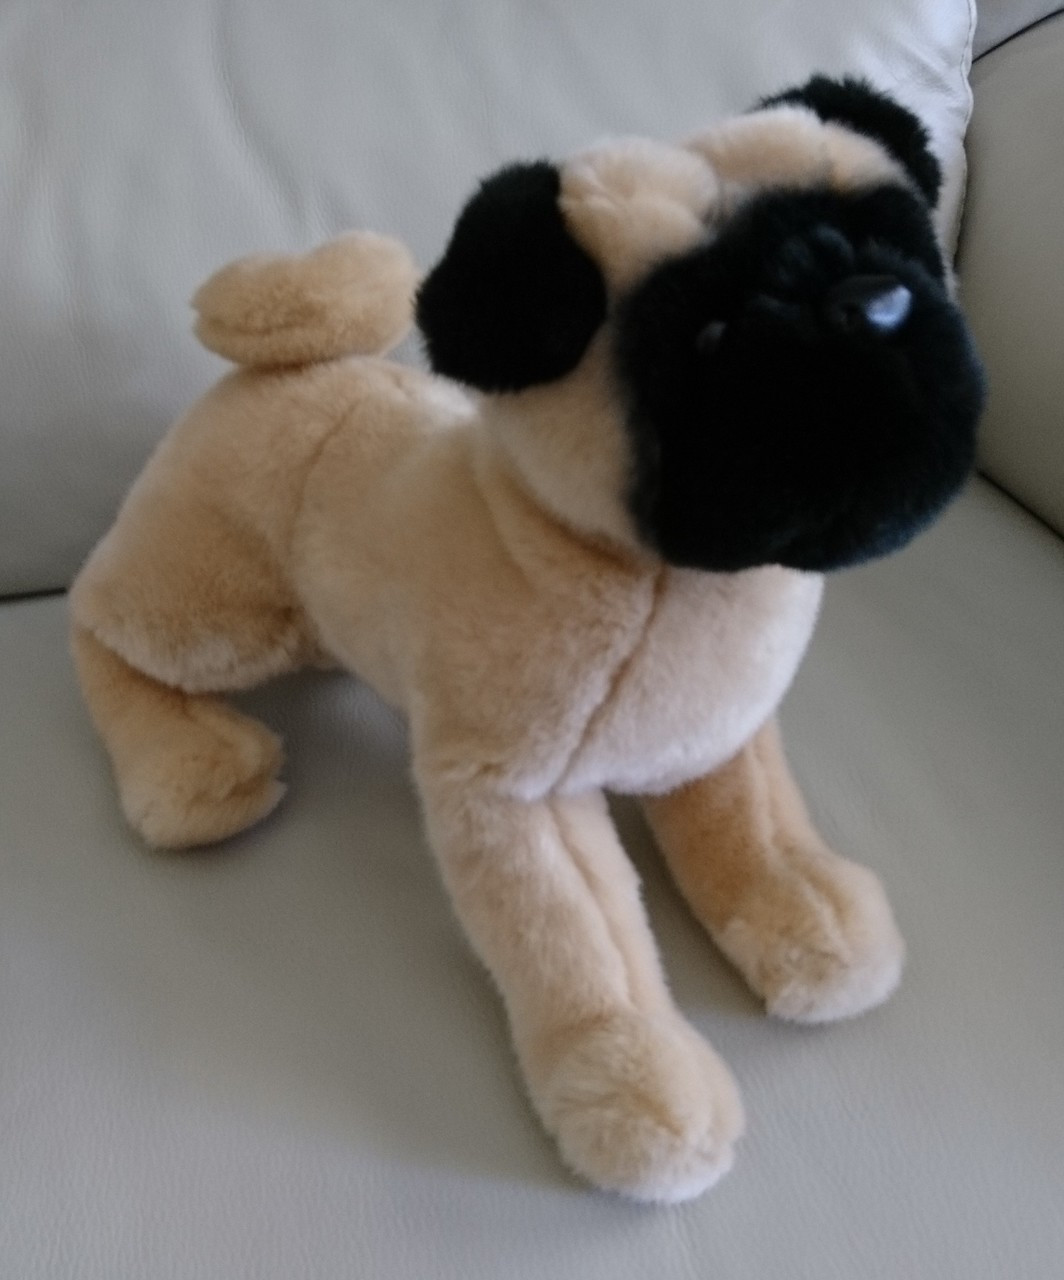 Realistic Pug Stuffed Animal, Pug Dog Stuffed Animal Douglas Cuddle Toy Realistic Look Plush Tan And Black 12 Pre Owned Treasure Website